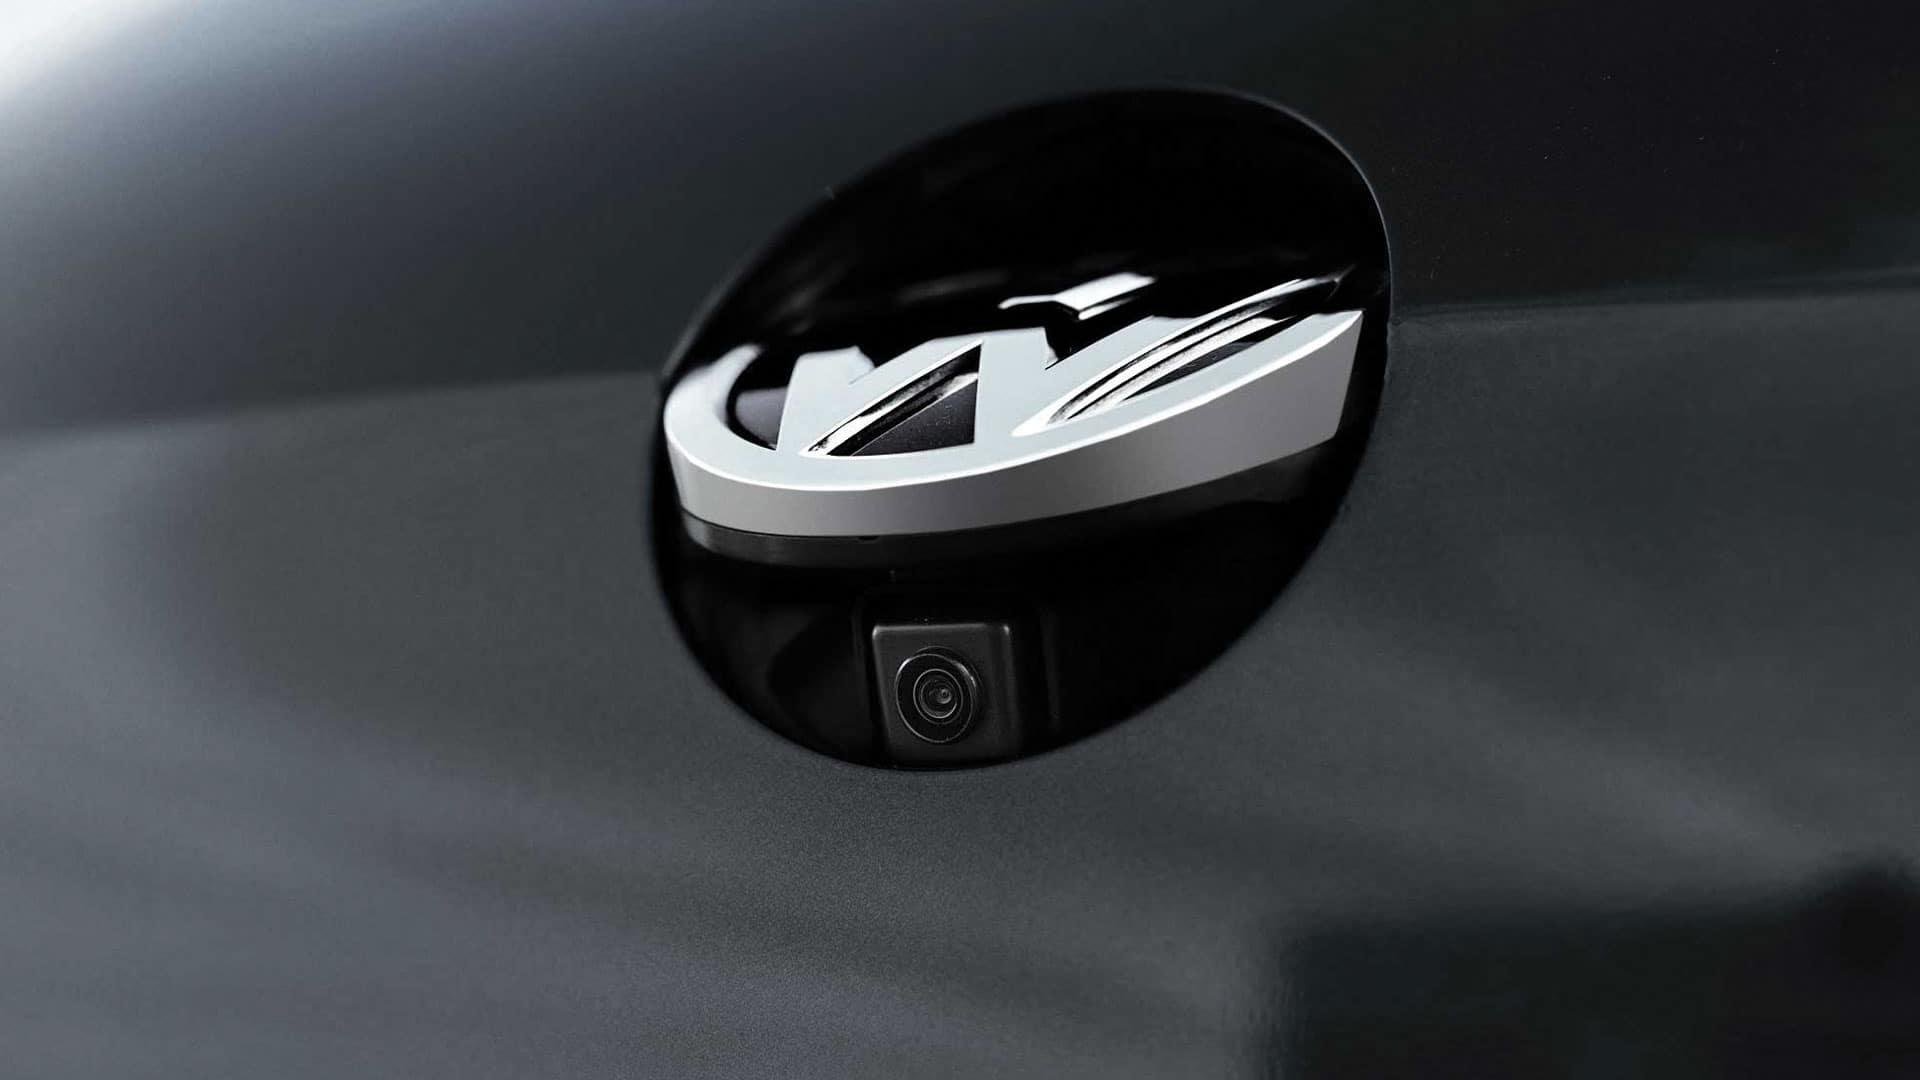 2019 VW Golf GTI rearview camera